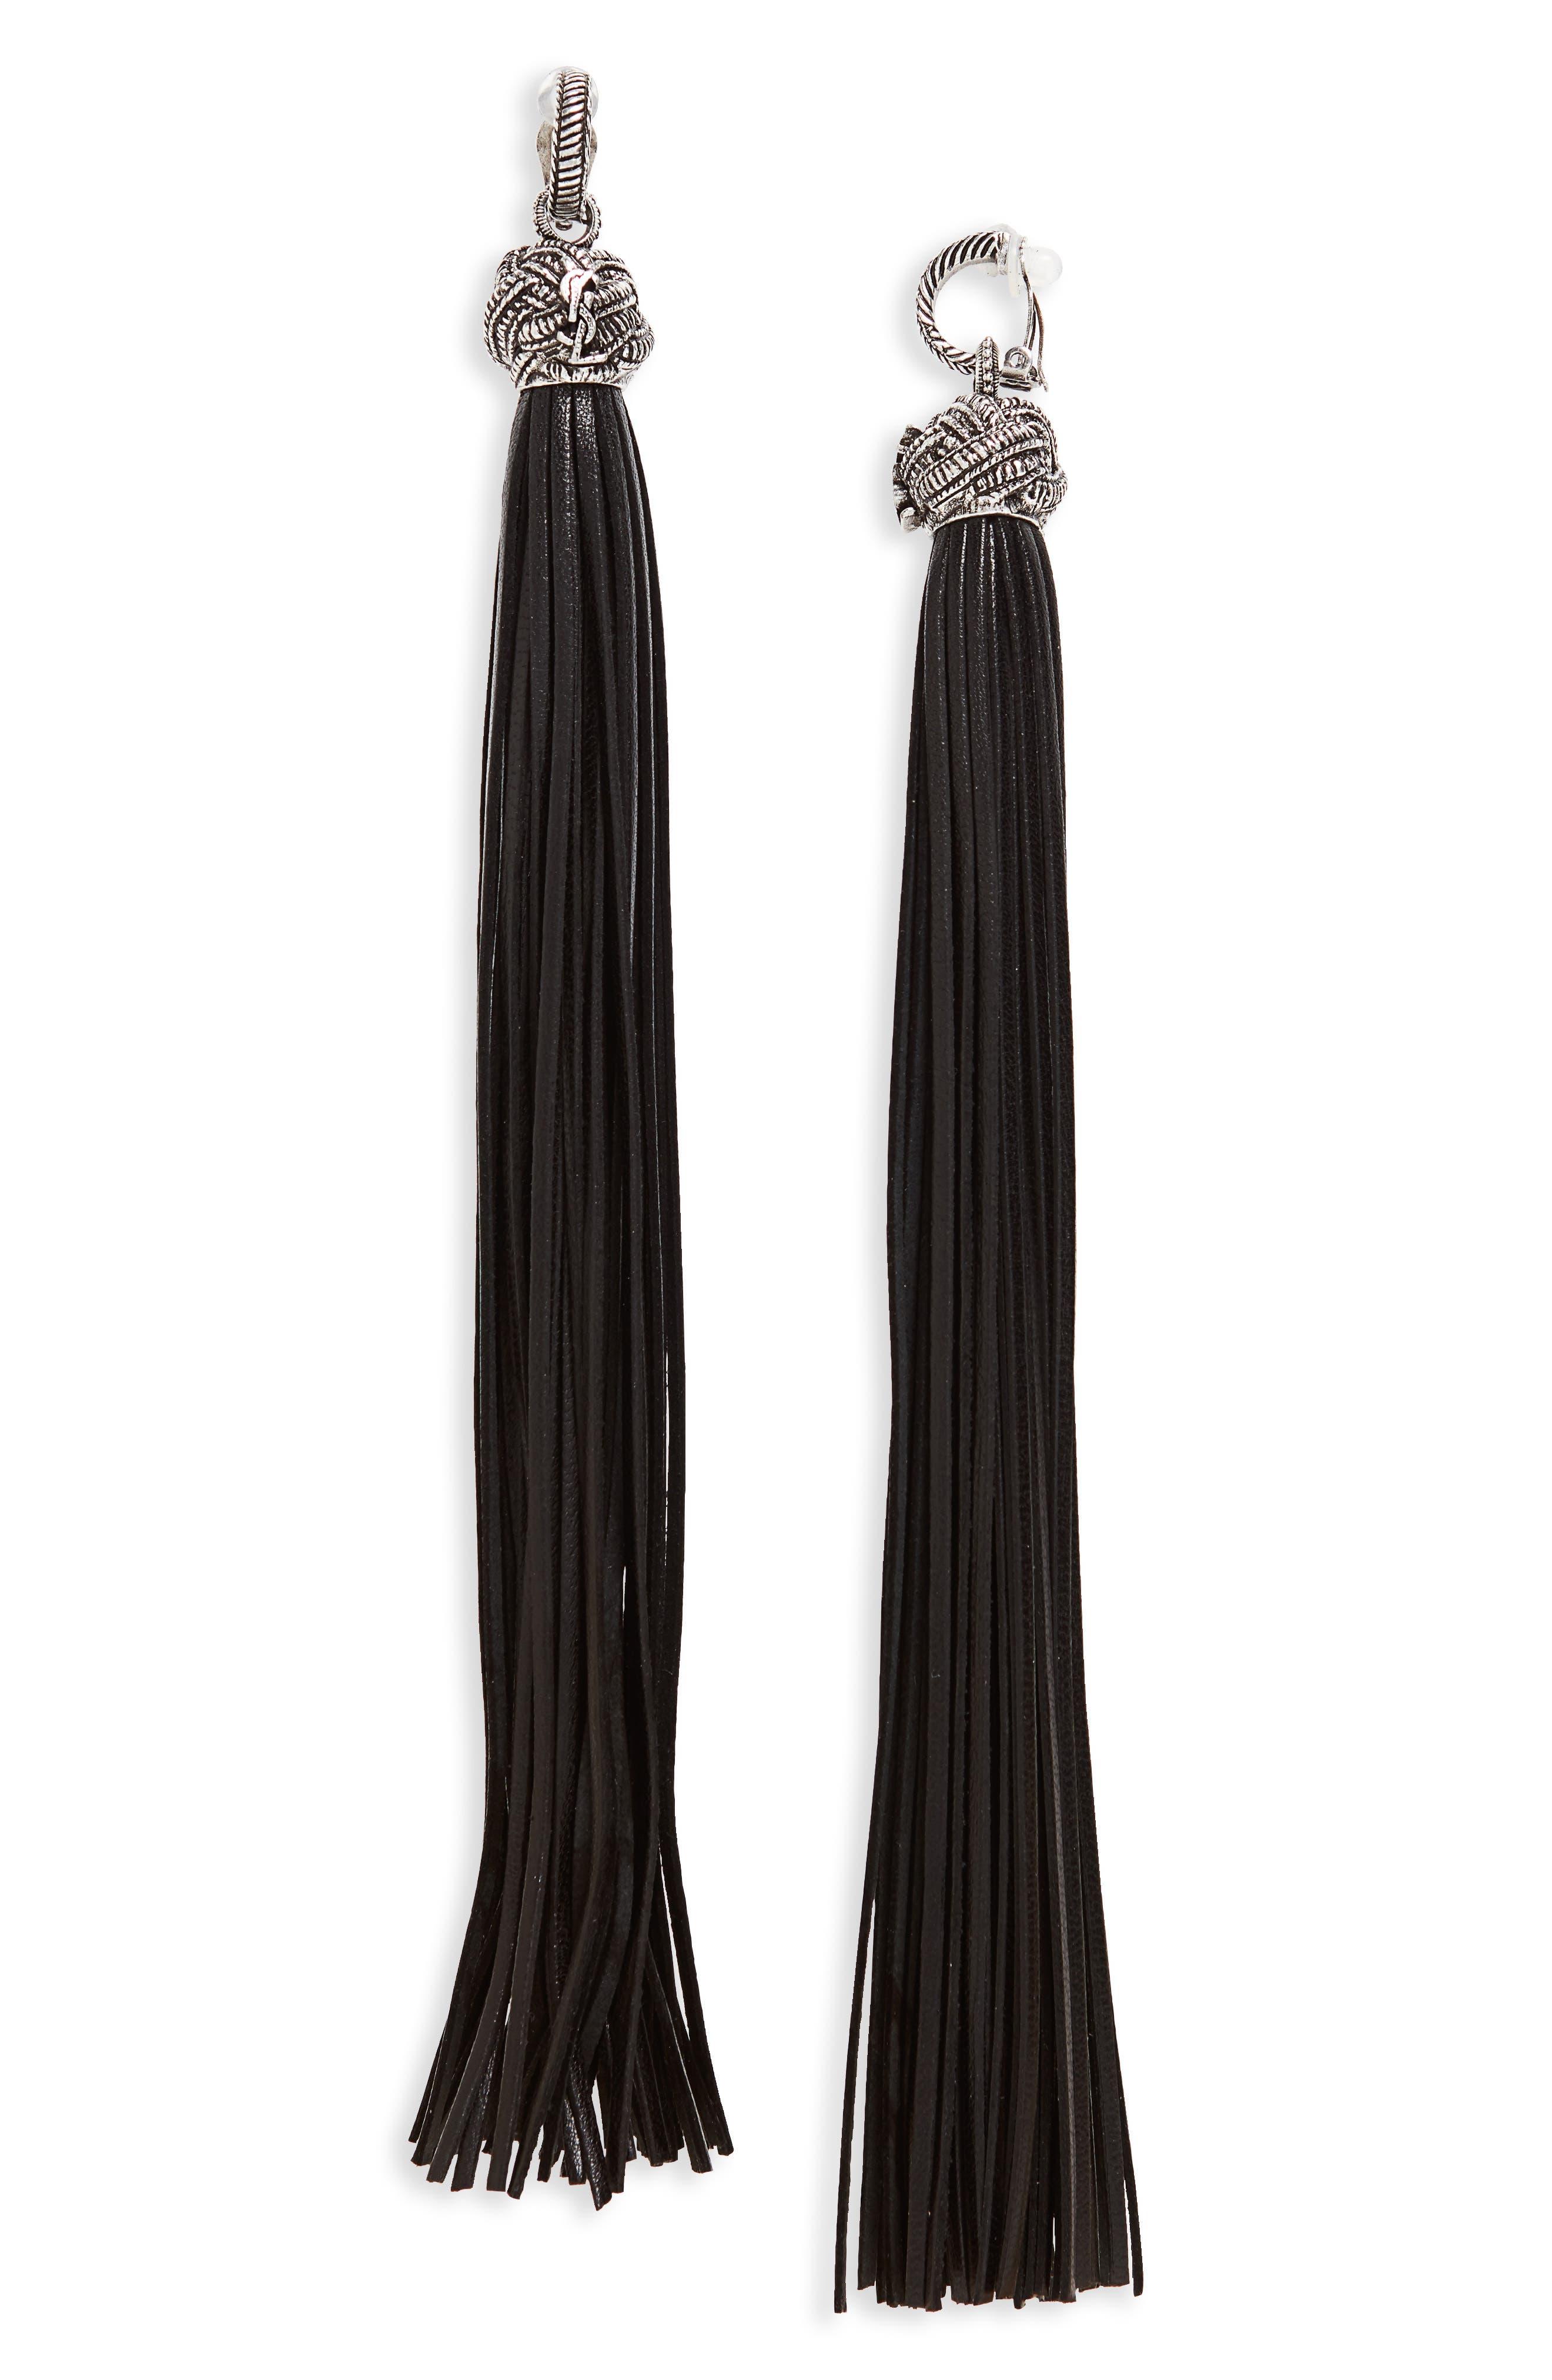 Leather Tassel Earrings,                         Main,                         color, ARGENT OXYDE/ NOIR